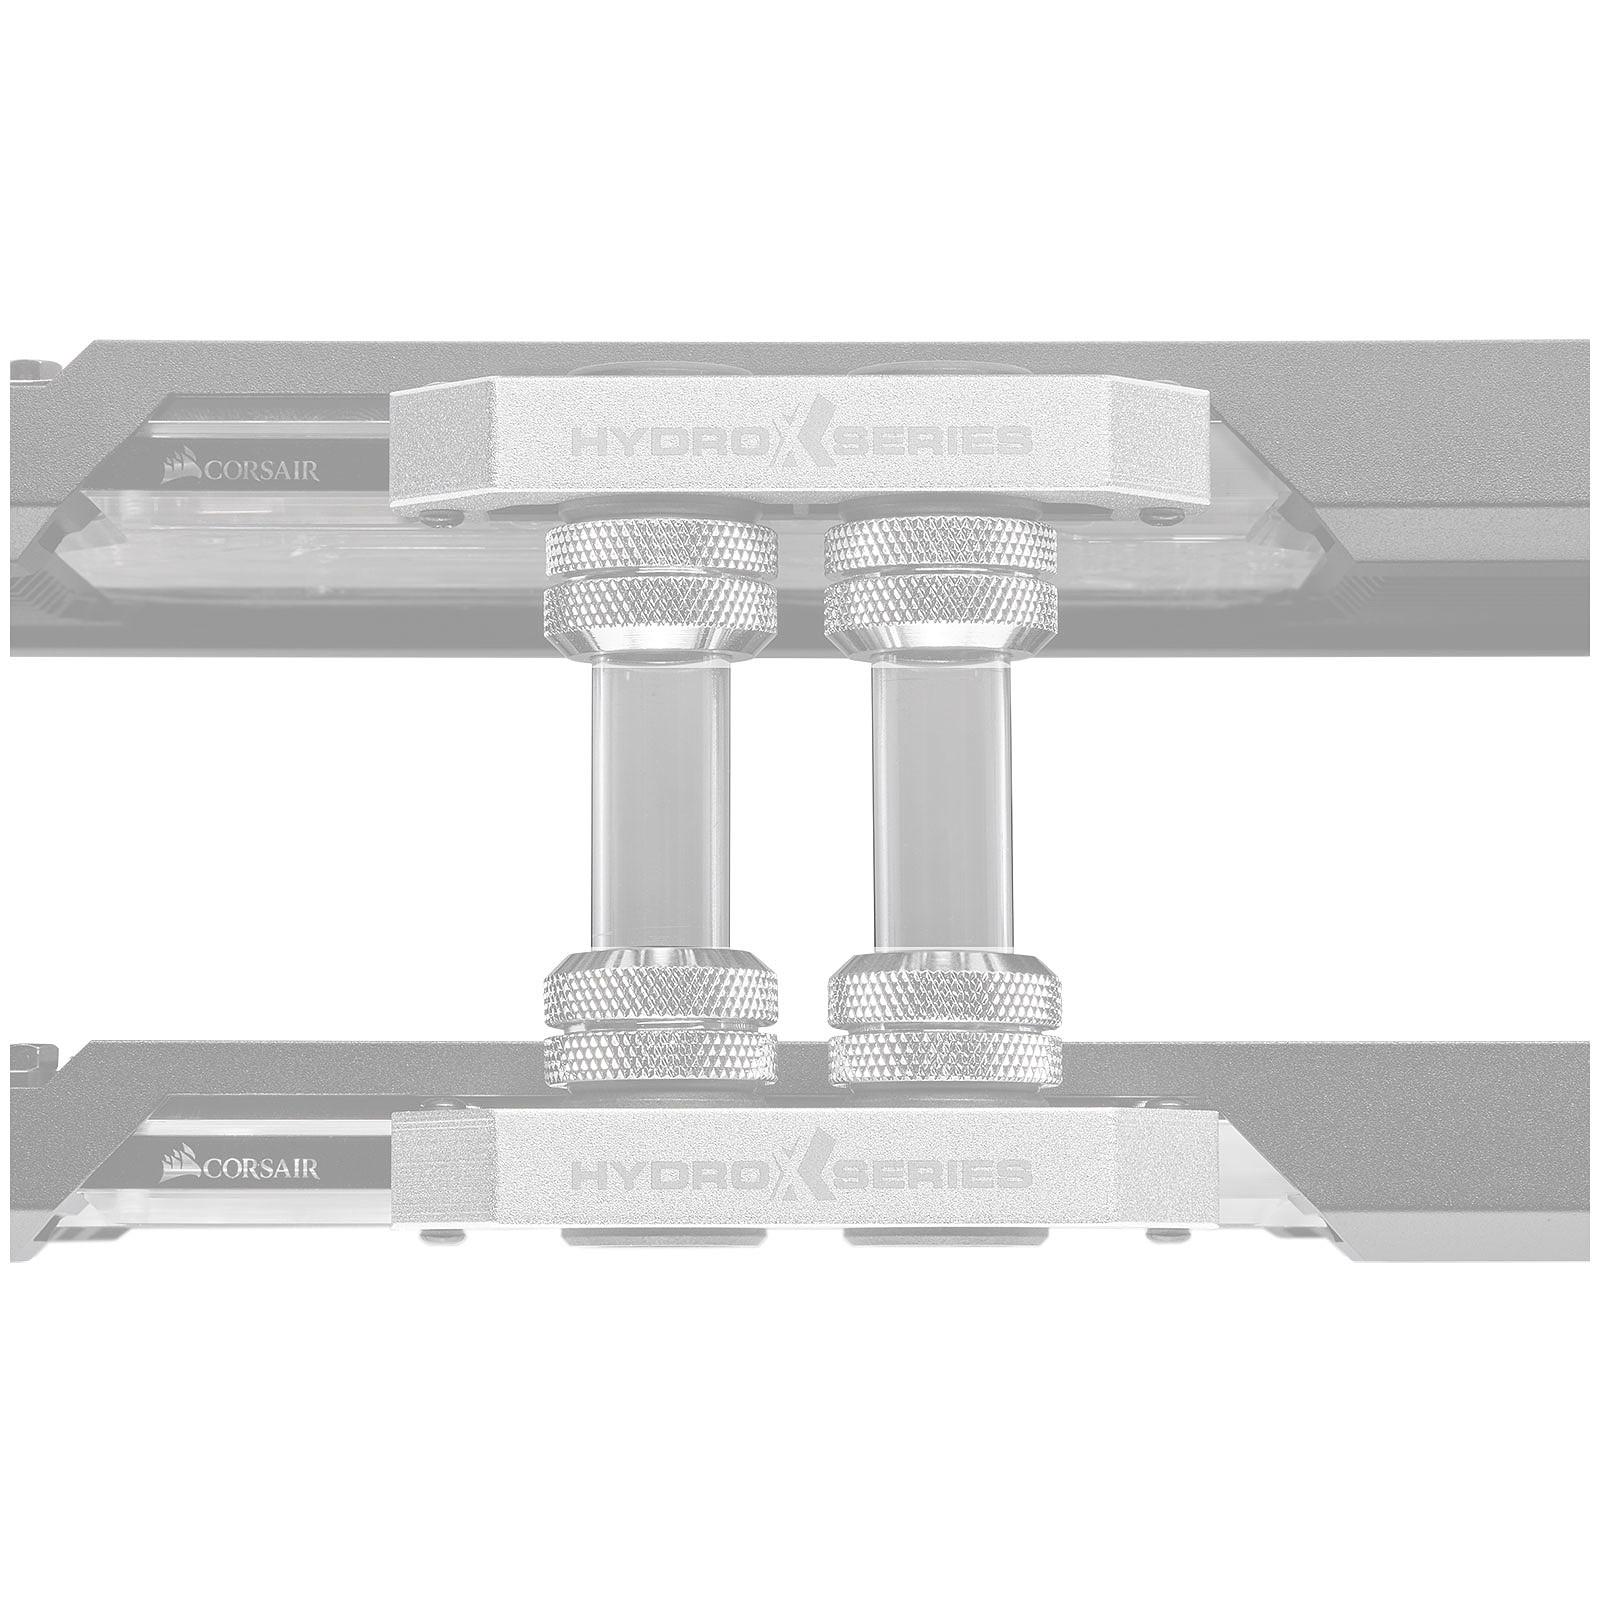 Corsair Hydro X Series XT Tuyau rigide SLI/CrossFire - Transparent (x 6)